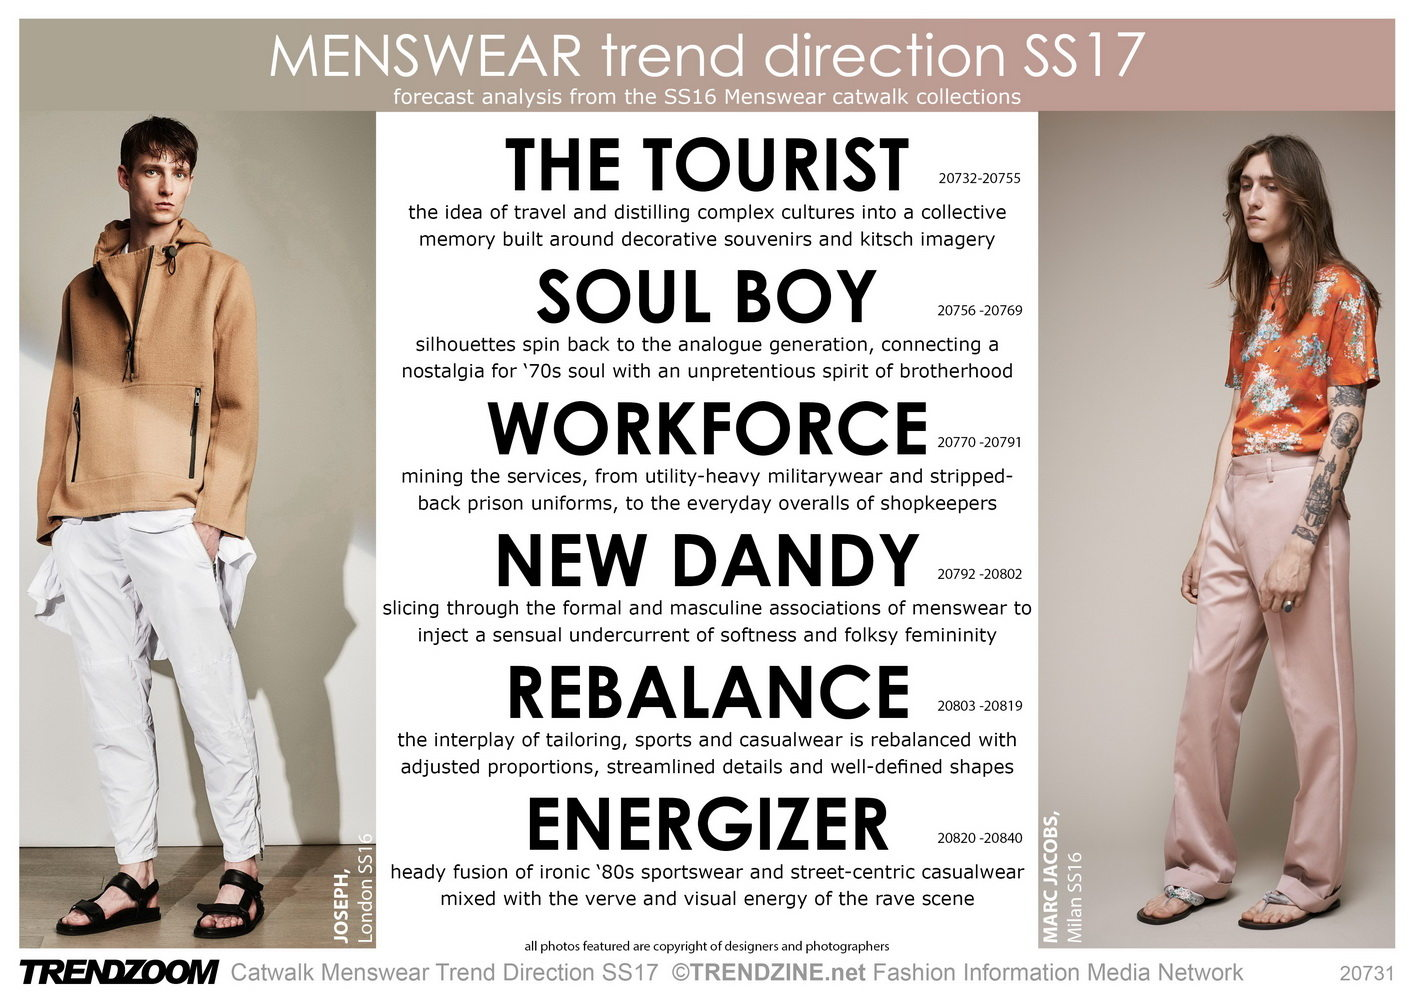 Trendzoom catwalk menswear trend direction ss 2017